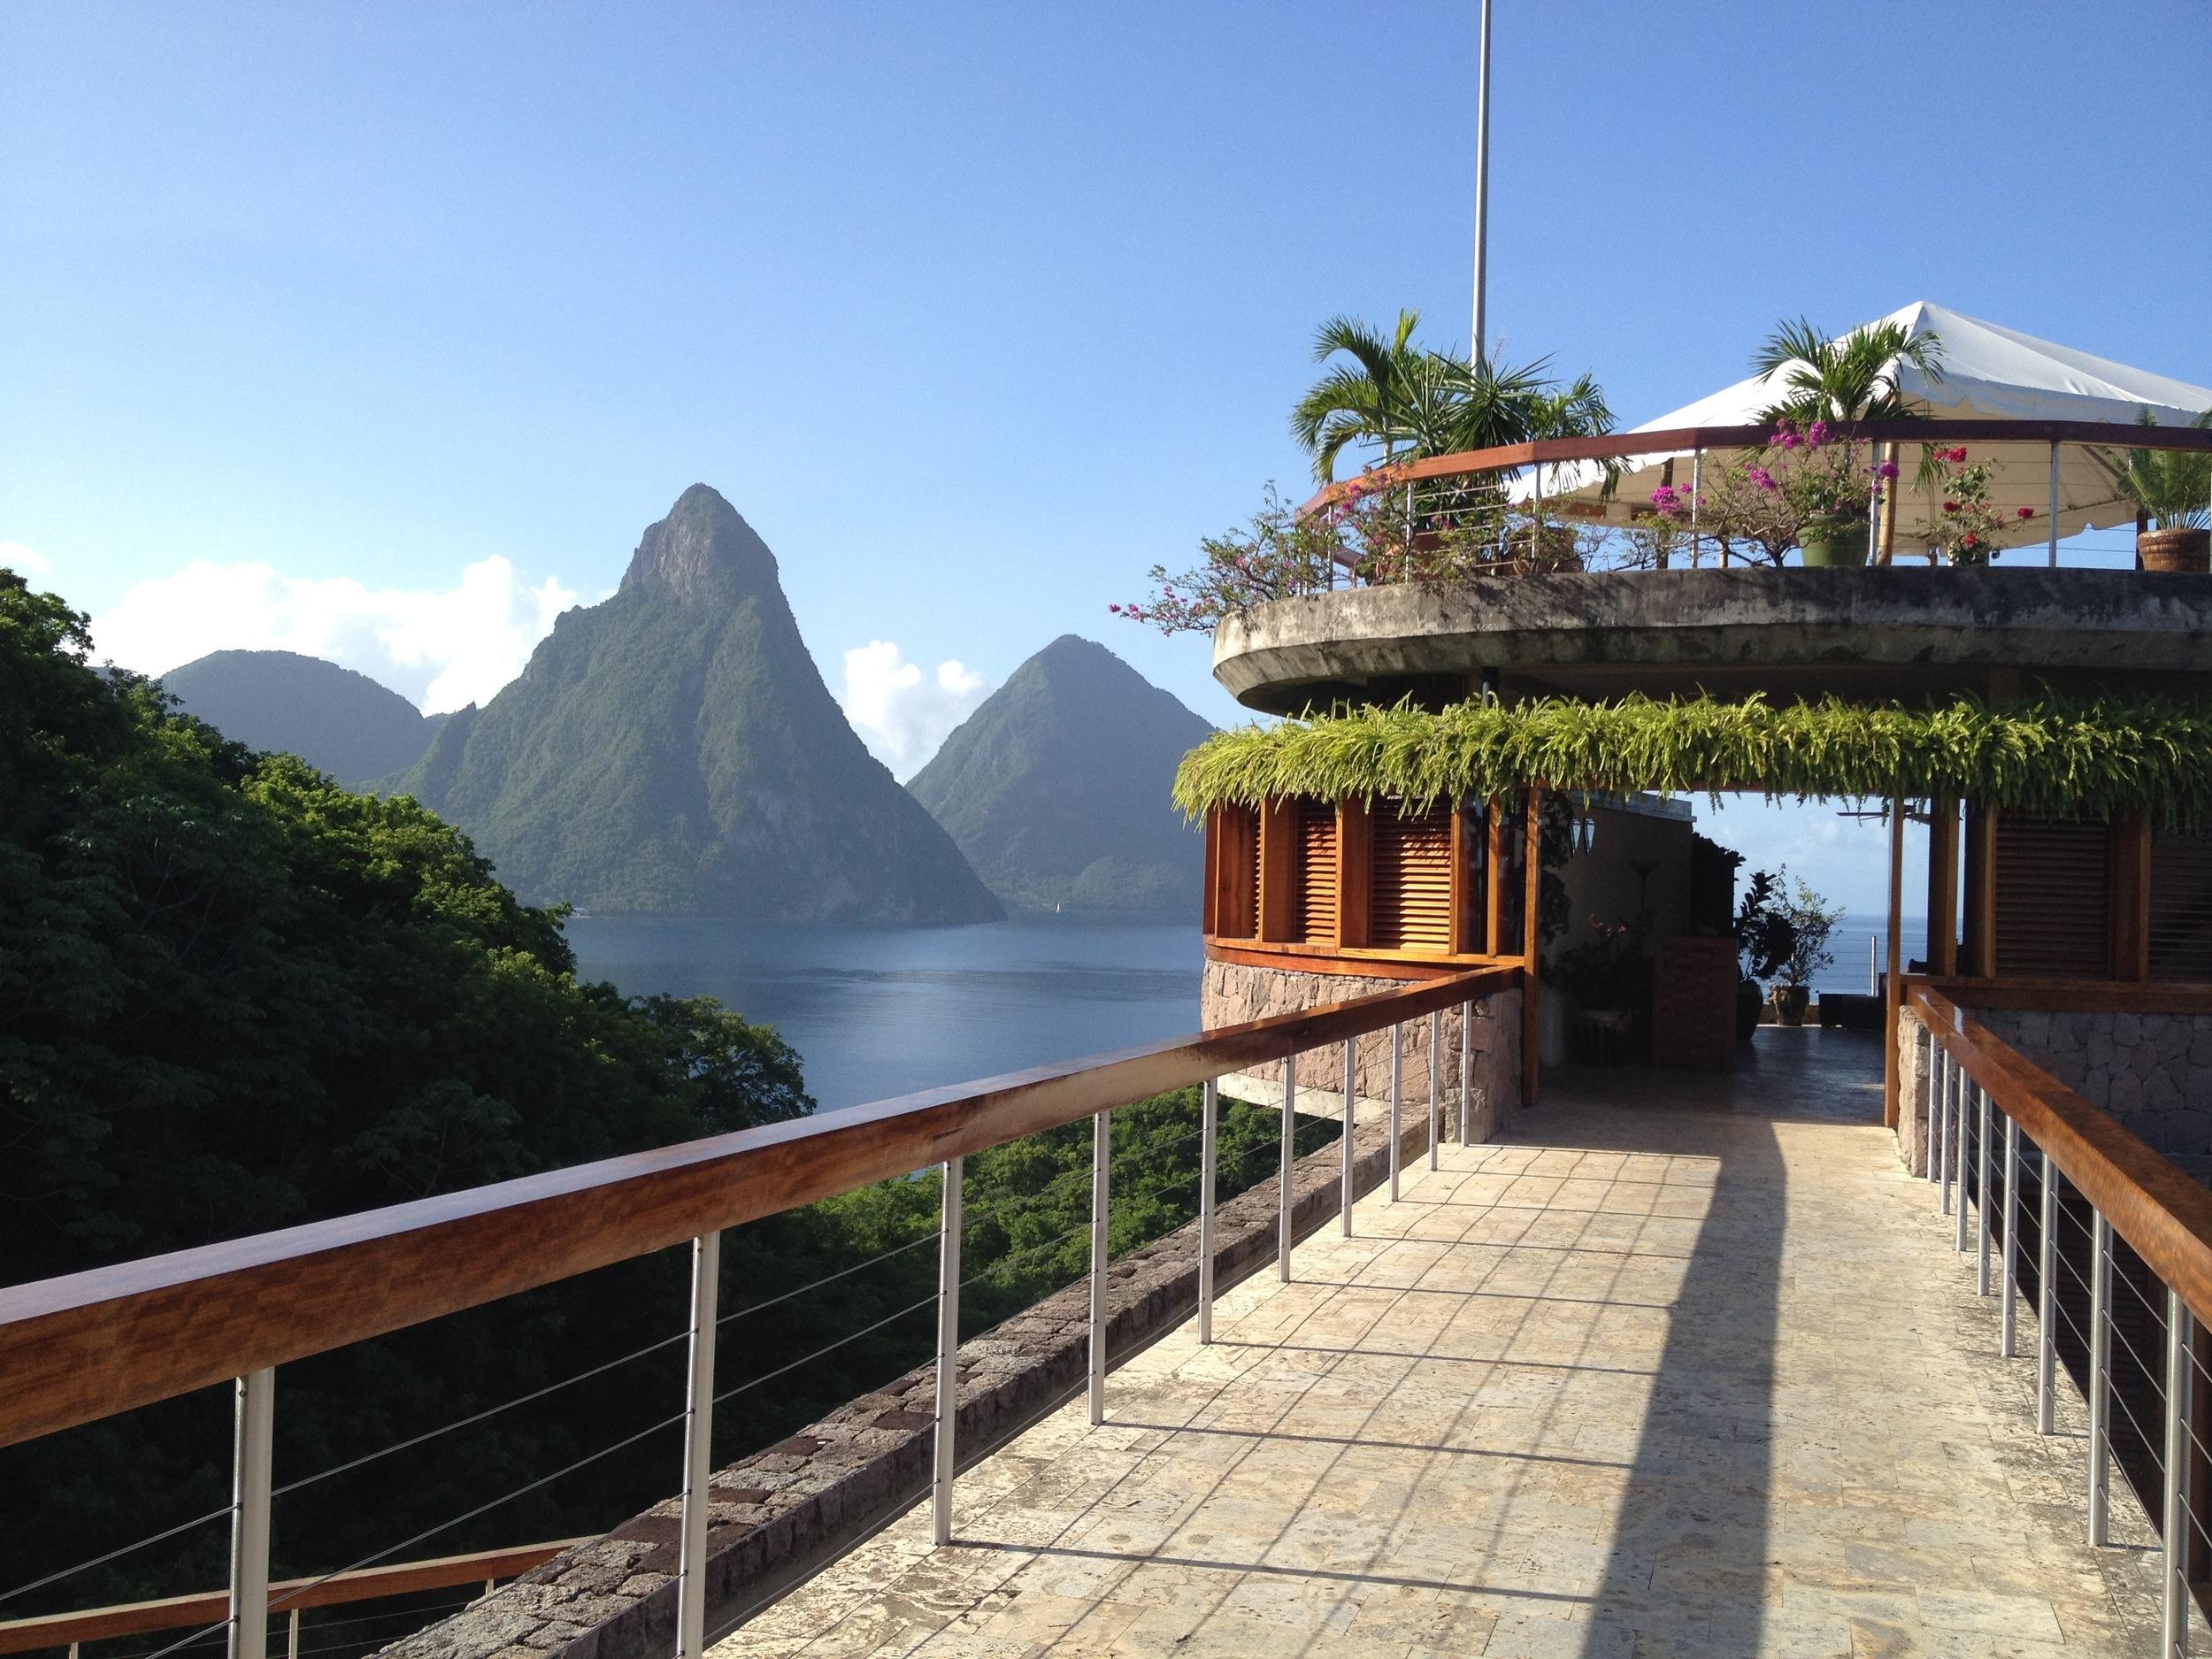 Walkway to the Jade Mountain Club at Jade Mountain Resort in Saint Lucia.